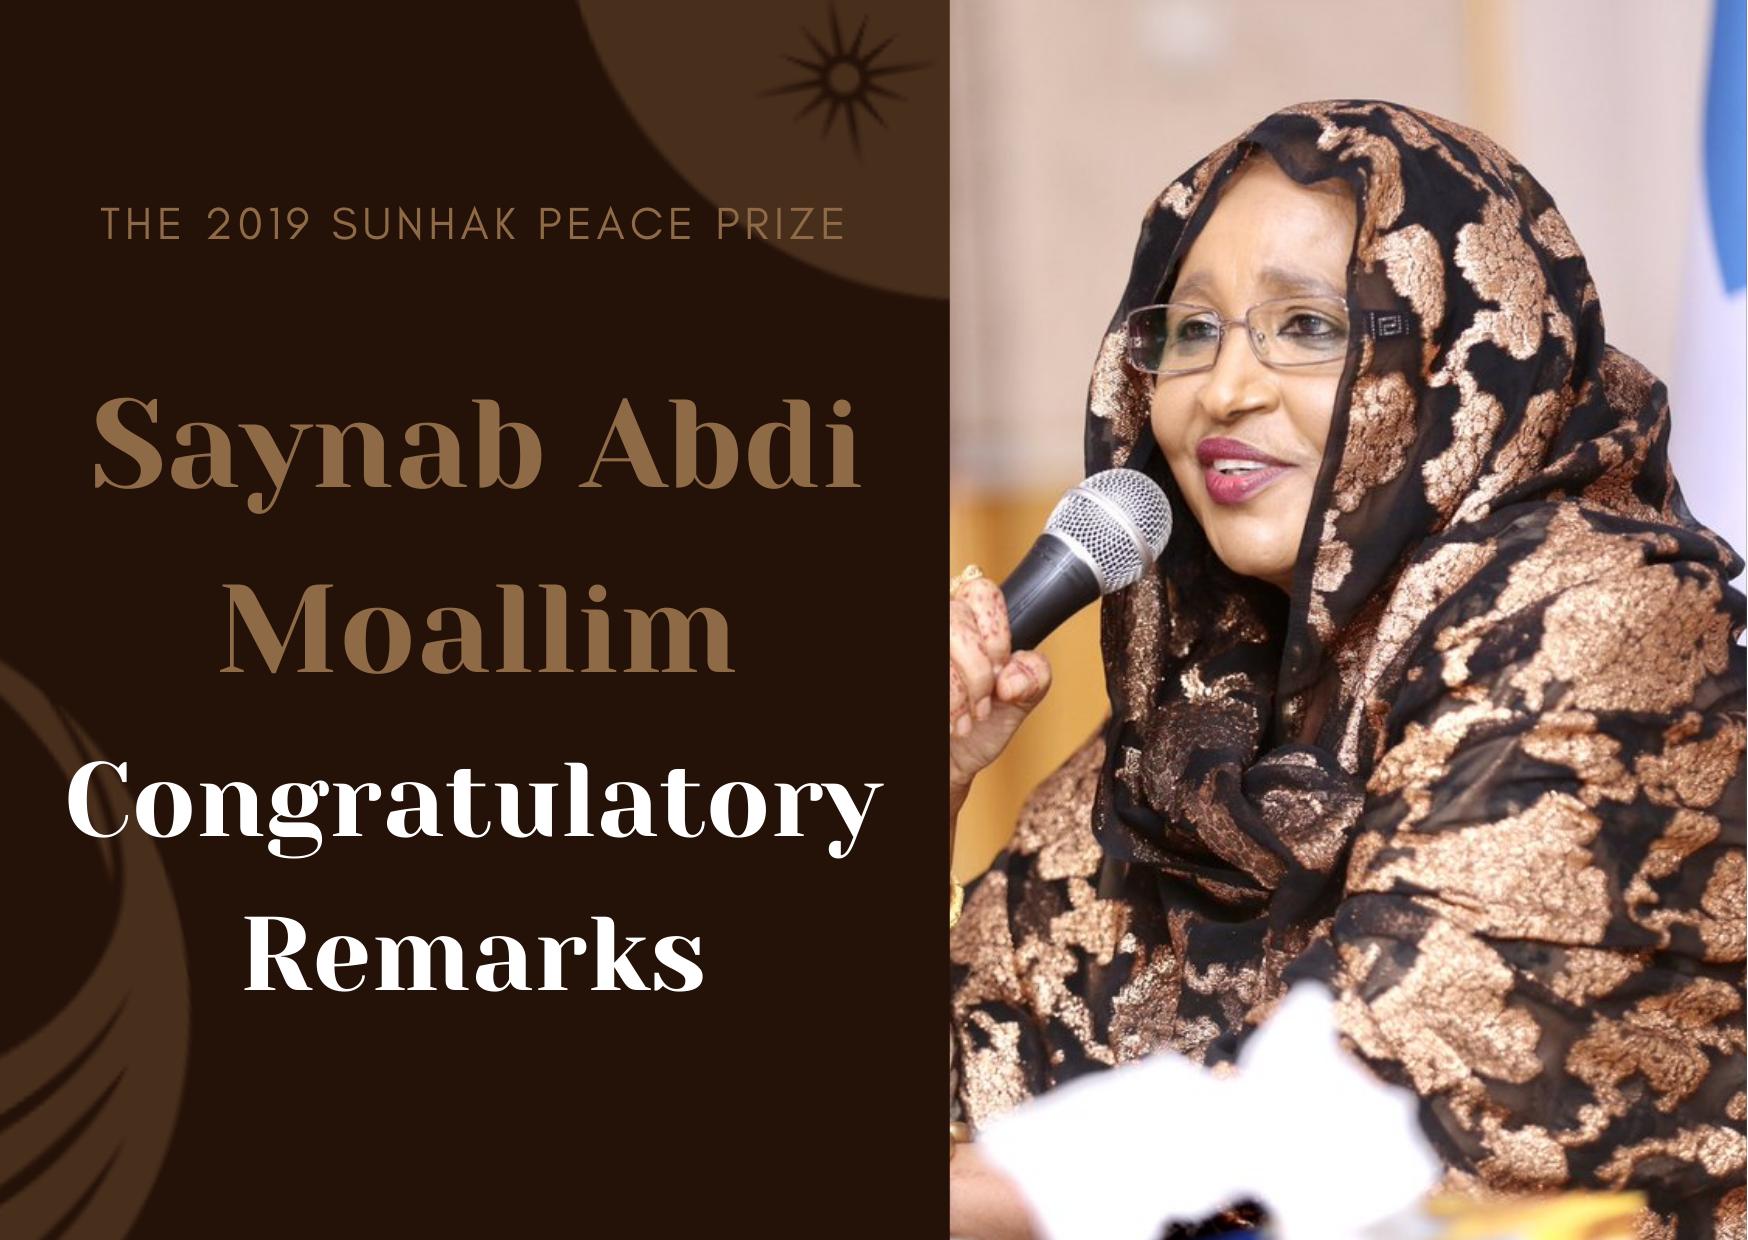 2019 Laureate Award Ceremony Congratulatory Remarks - H.E. Saynab Abdi Moallim 썸네일